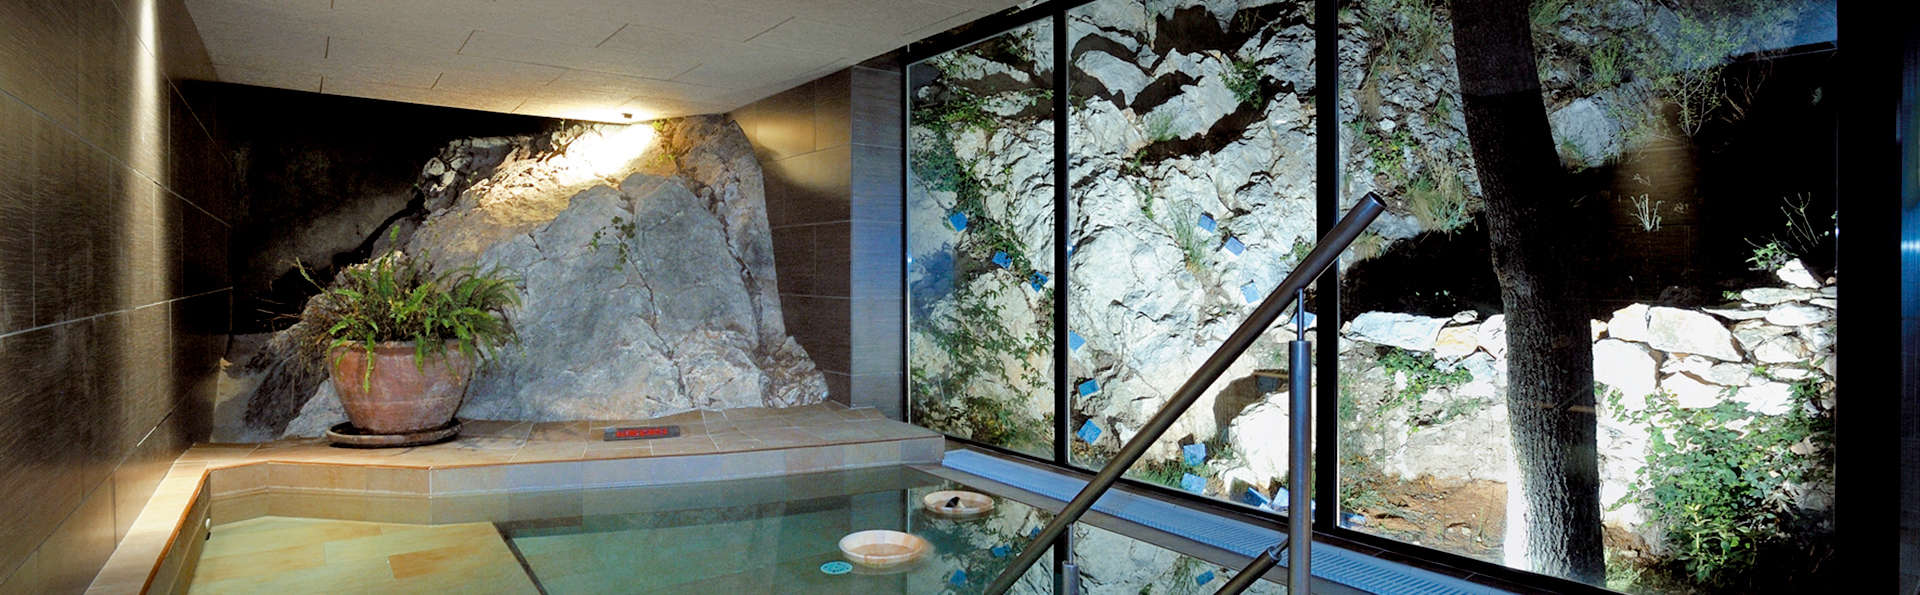 Hotel Balneario Sicilia - Edit_spa5.jpg